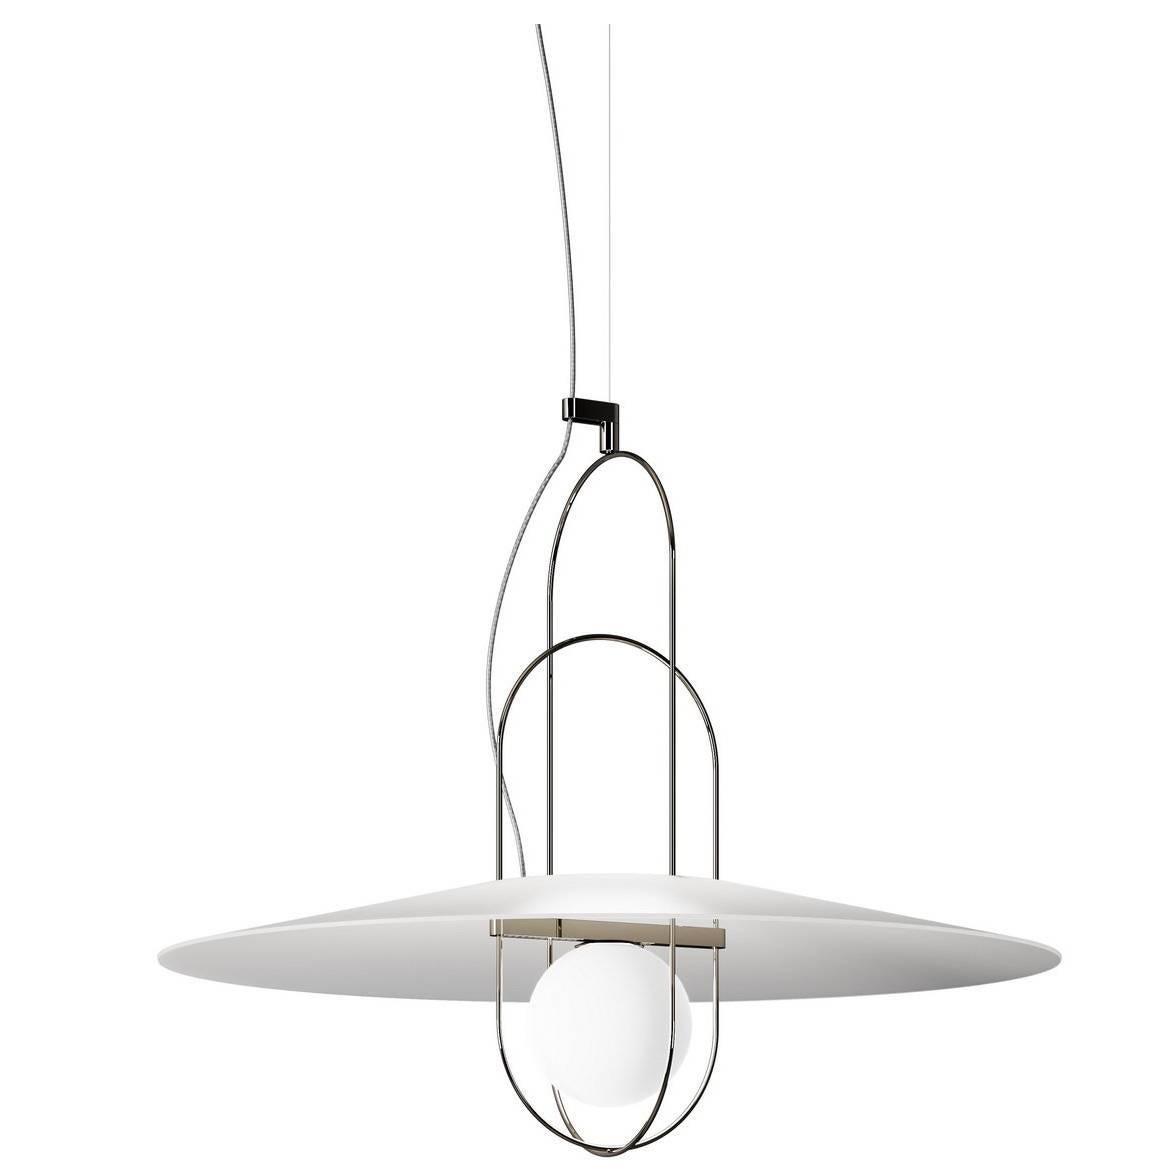 Setareh Pendant Lamp with Glass Diffuser by Francesco Librizzi for Fontana Arte